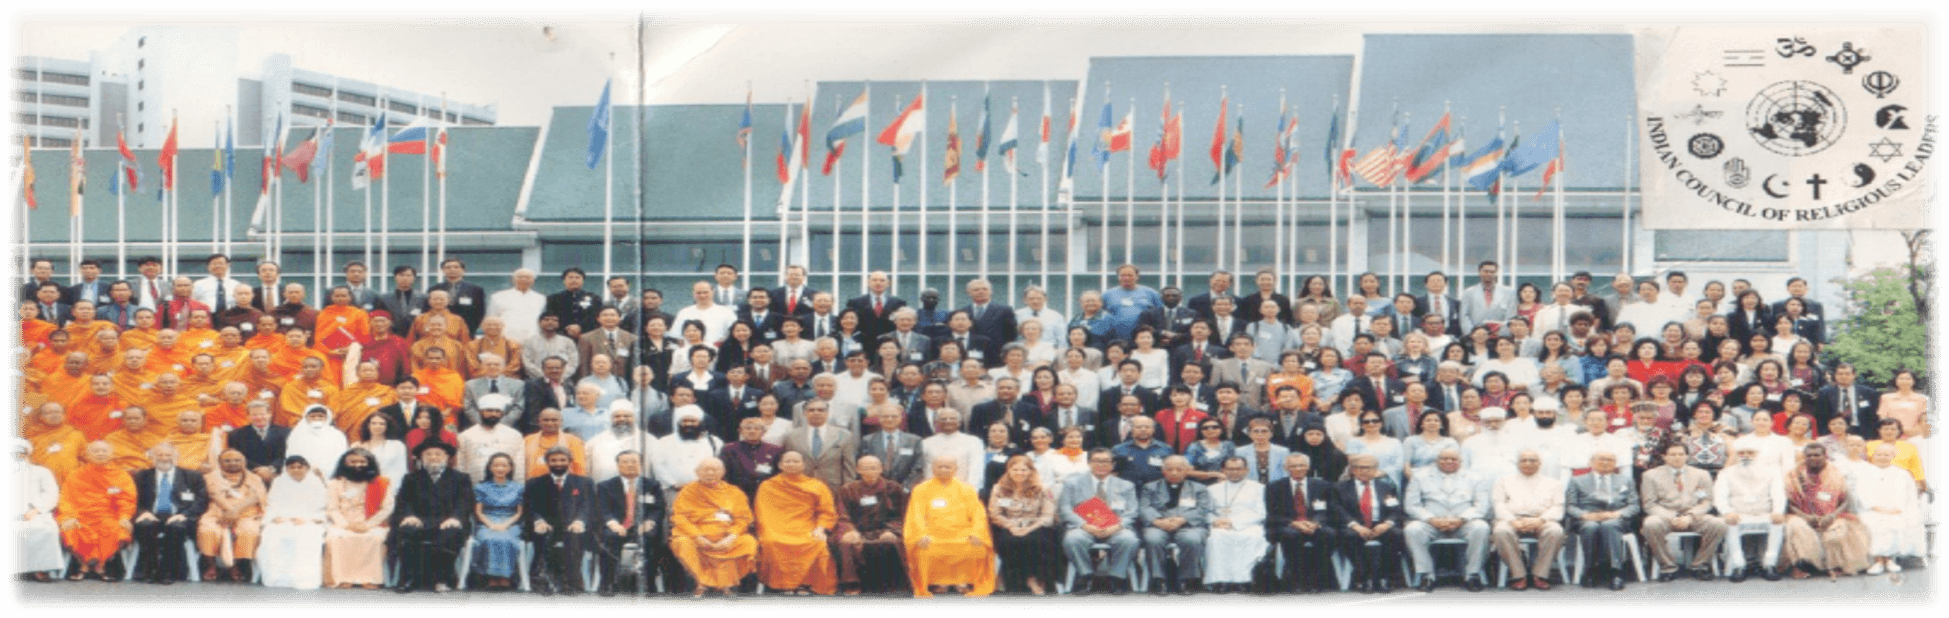 UN Millennium World Peace Summit in New York USA